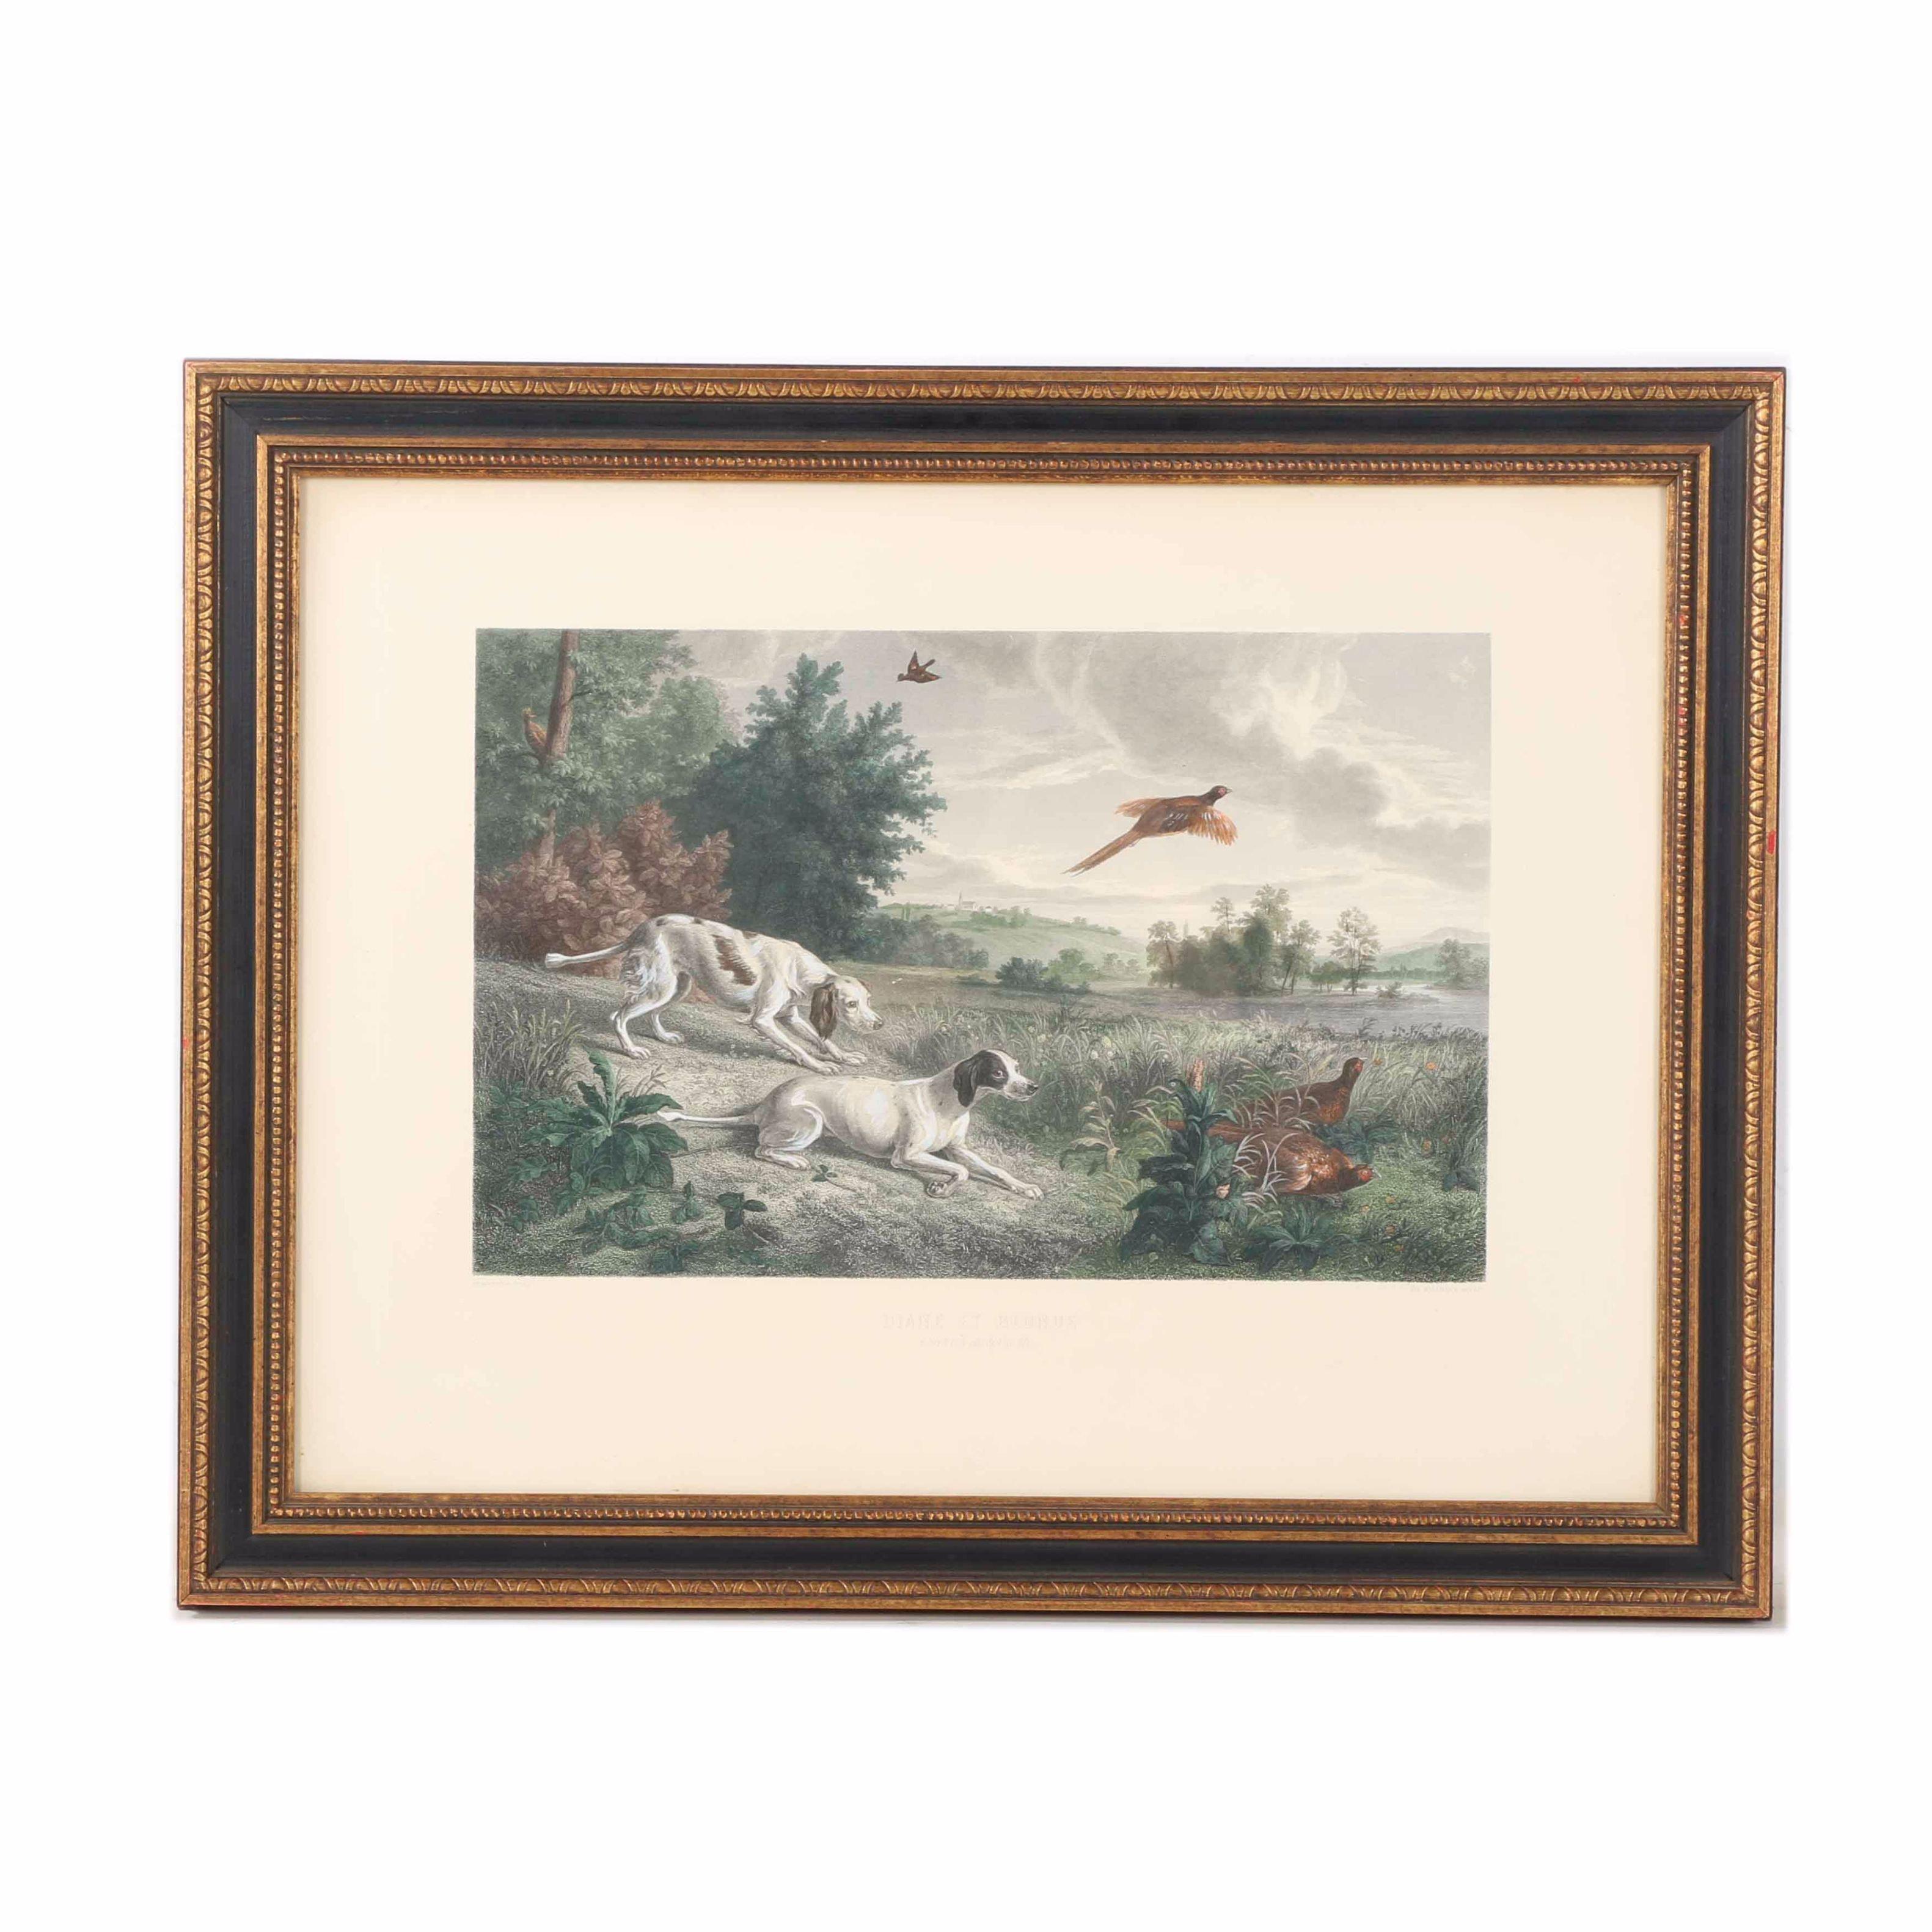 "Hand-Colored Etching After Alexandre-François Desportes ""Louis XIV's Hunting Dogs: Diane et Blonde"""